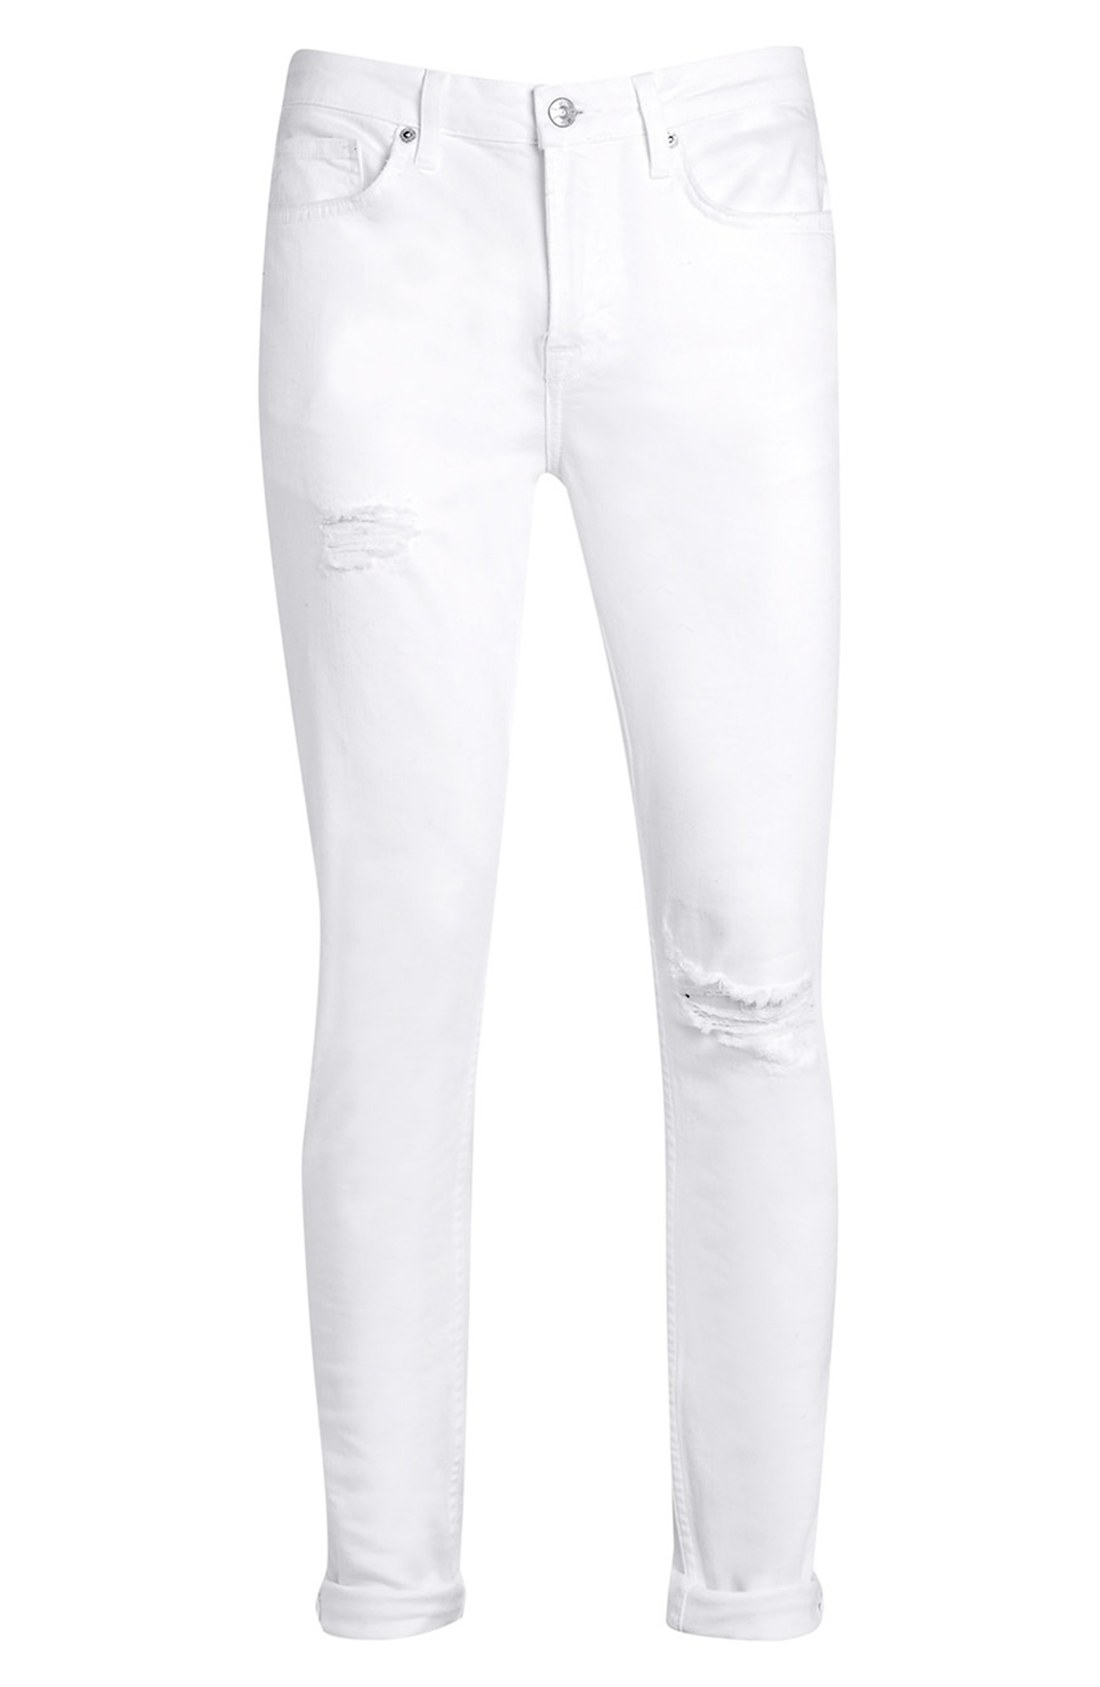 Topman-Ripped-Stretch-Skinny-Fit-Jean-5